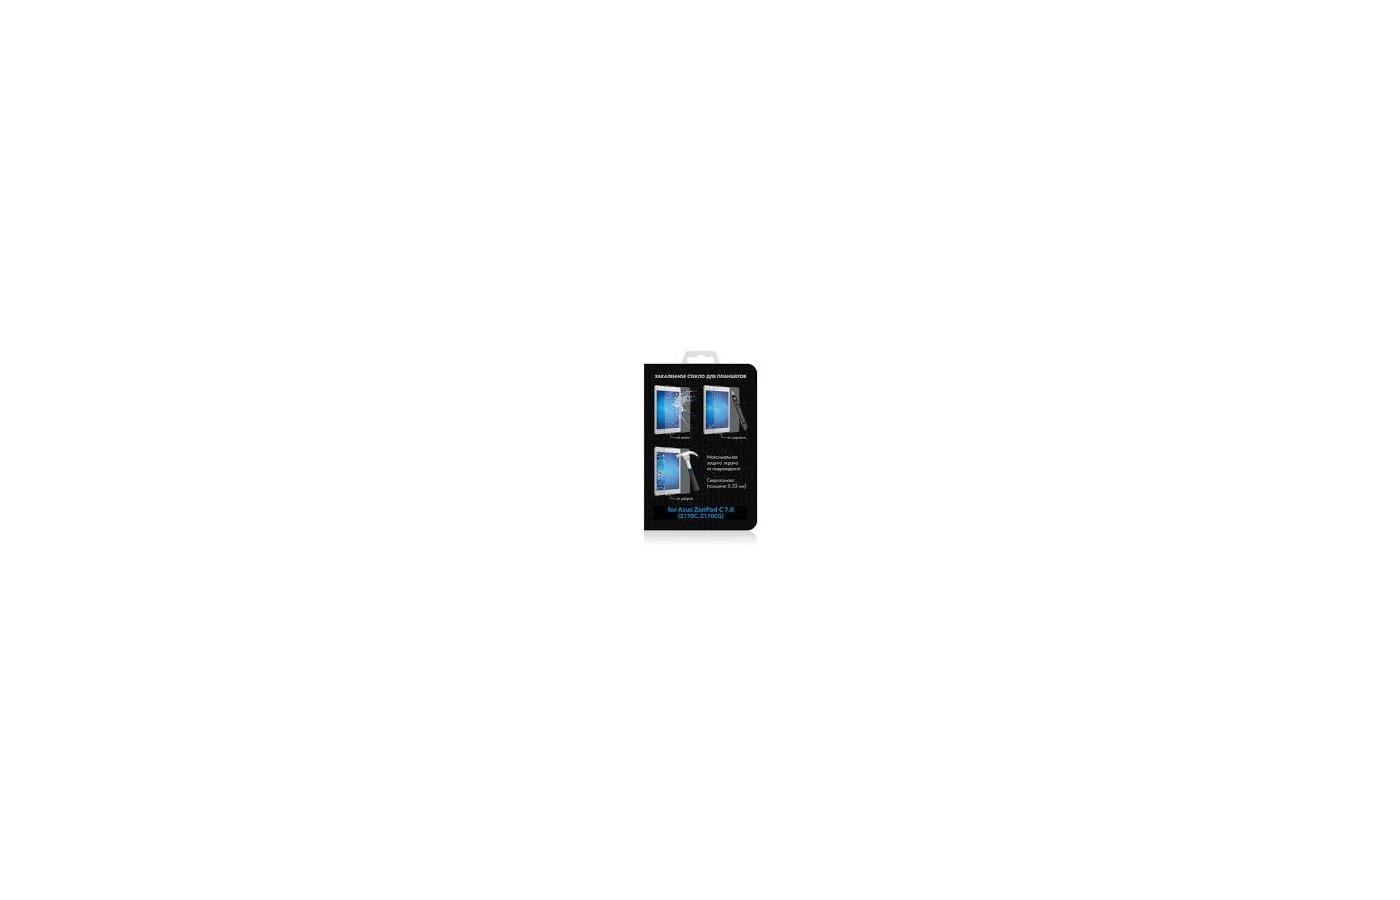 Защитная пленка DF Стекло для Samsung Galaxy Tab A 9.7 sSteel-29